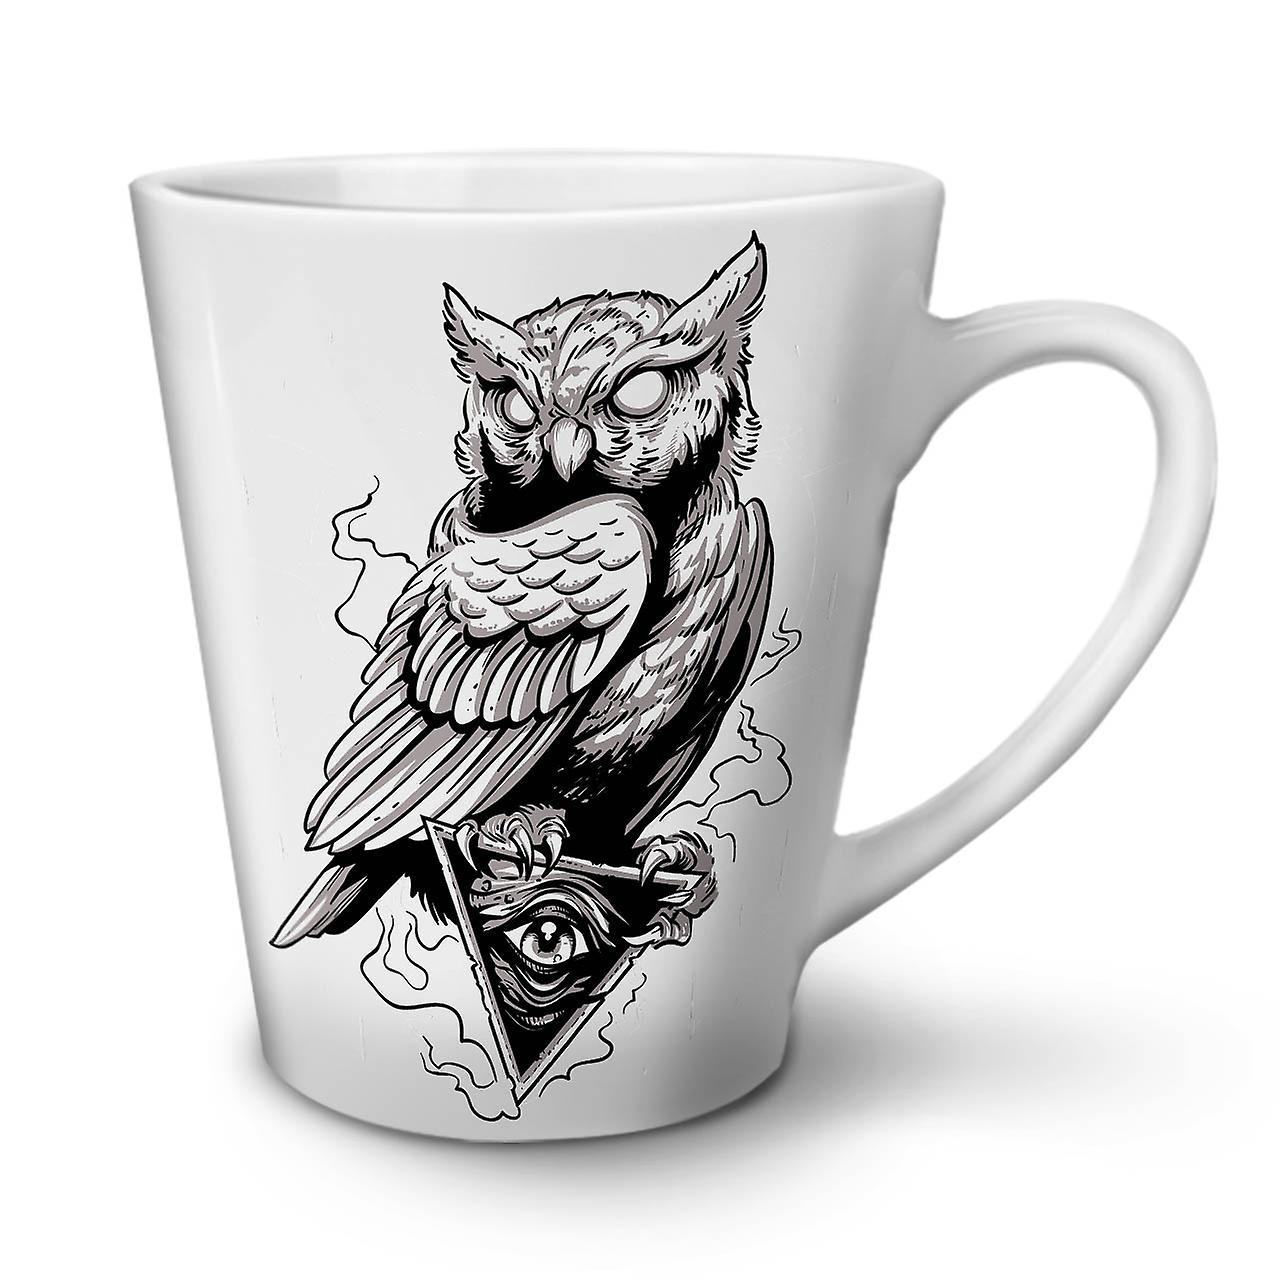 Ceramic Triangle New Coffee White Owl Tea Latte 12 Mug OzWellcoda 1cTJlFuK3